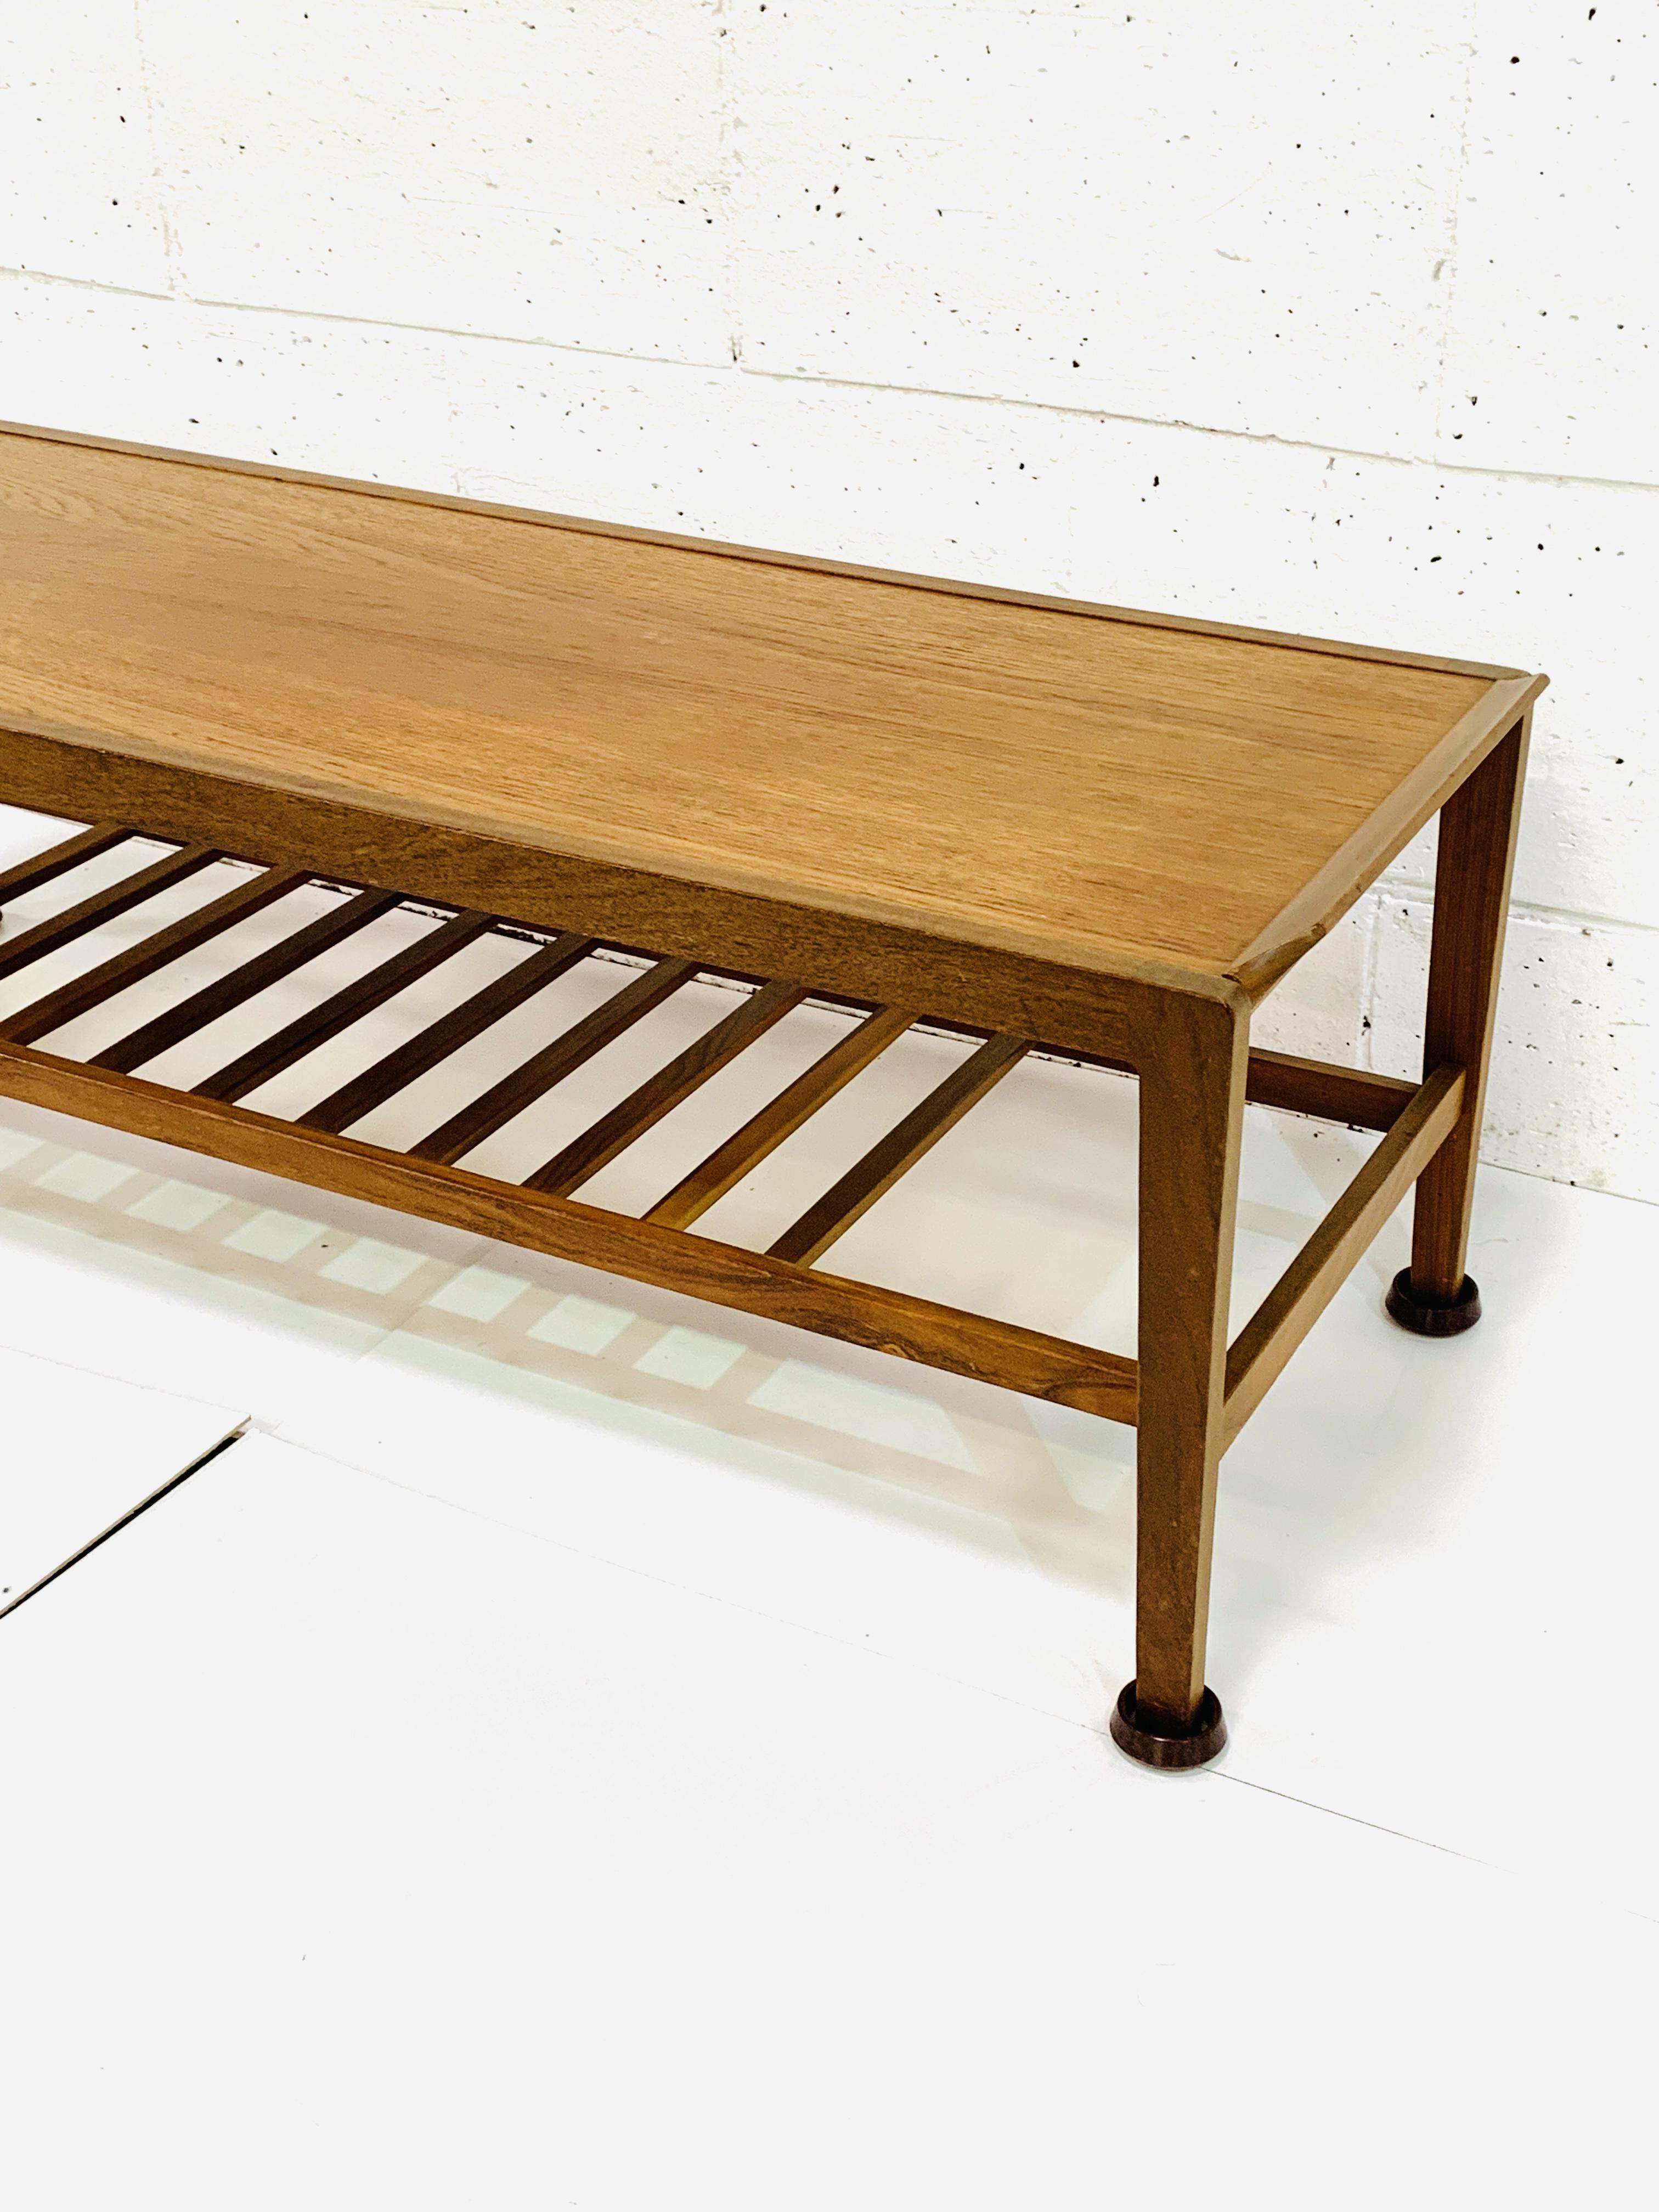 Teak coffee table with newspaper rack under - Image 3 of 4